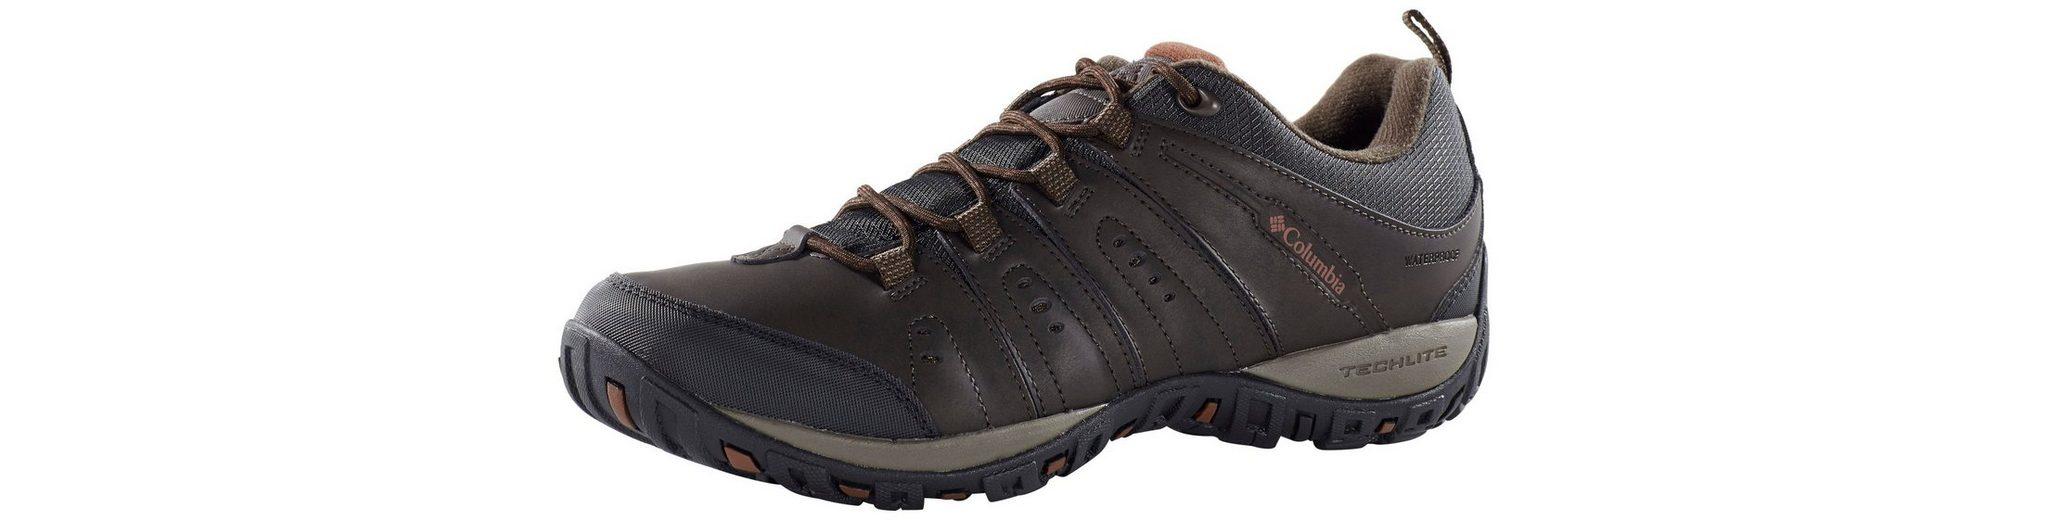 Columbia Kletterschuh Peakfreak Woodburn II Shoes Men Waterproof